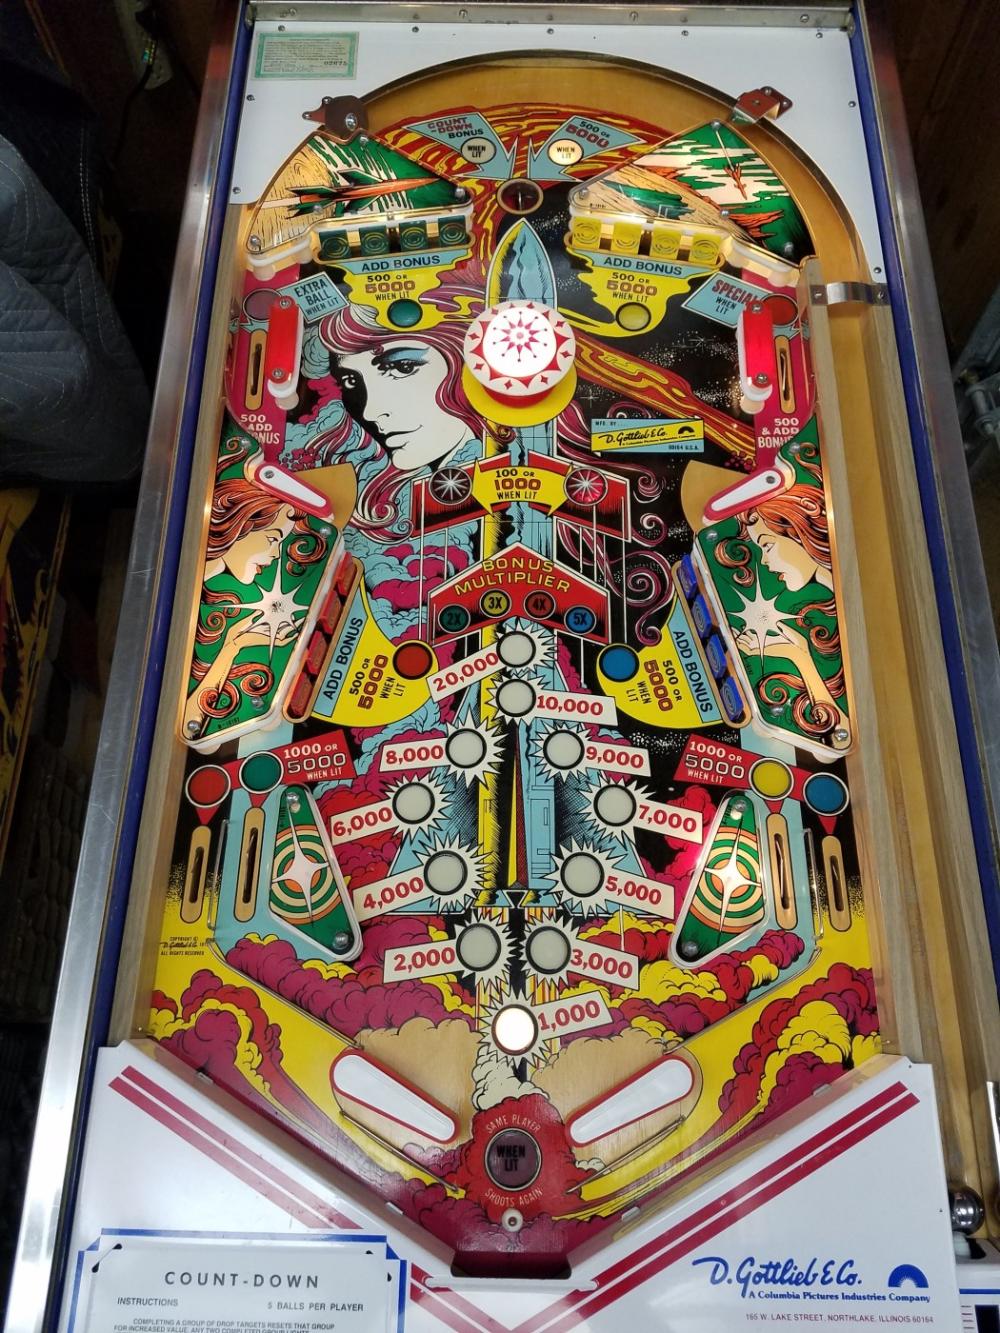 1979 Gottlieb Count Down Pinball Machine For Sale Pinside Market In 2020 Pinball Machine Pinball Art Pinball